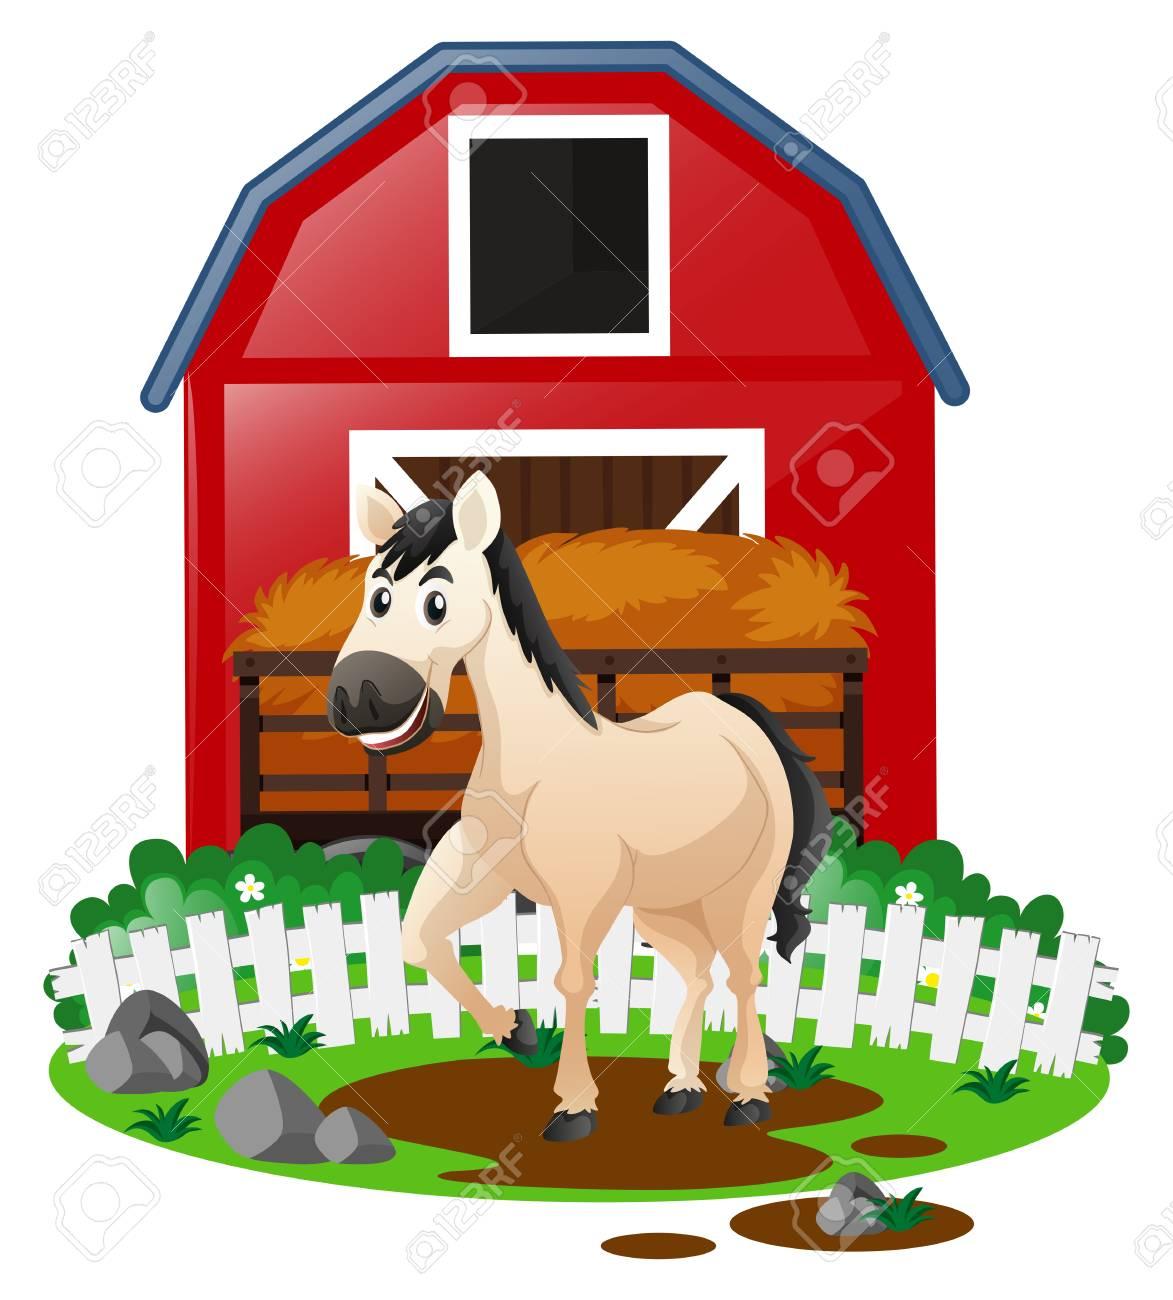 White horse in the farm illustration.